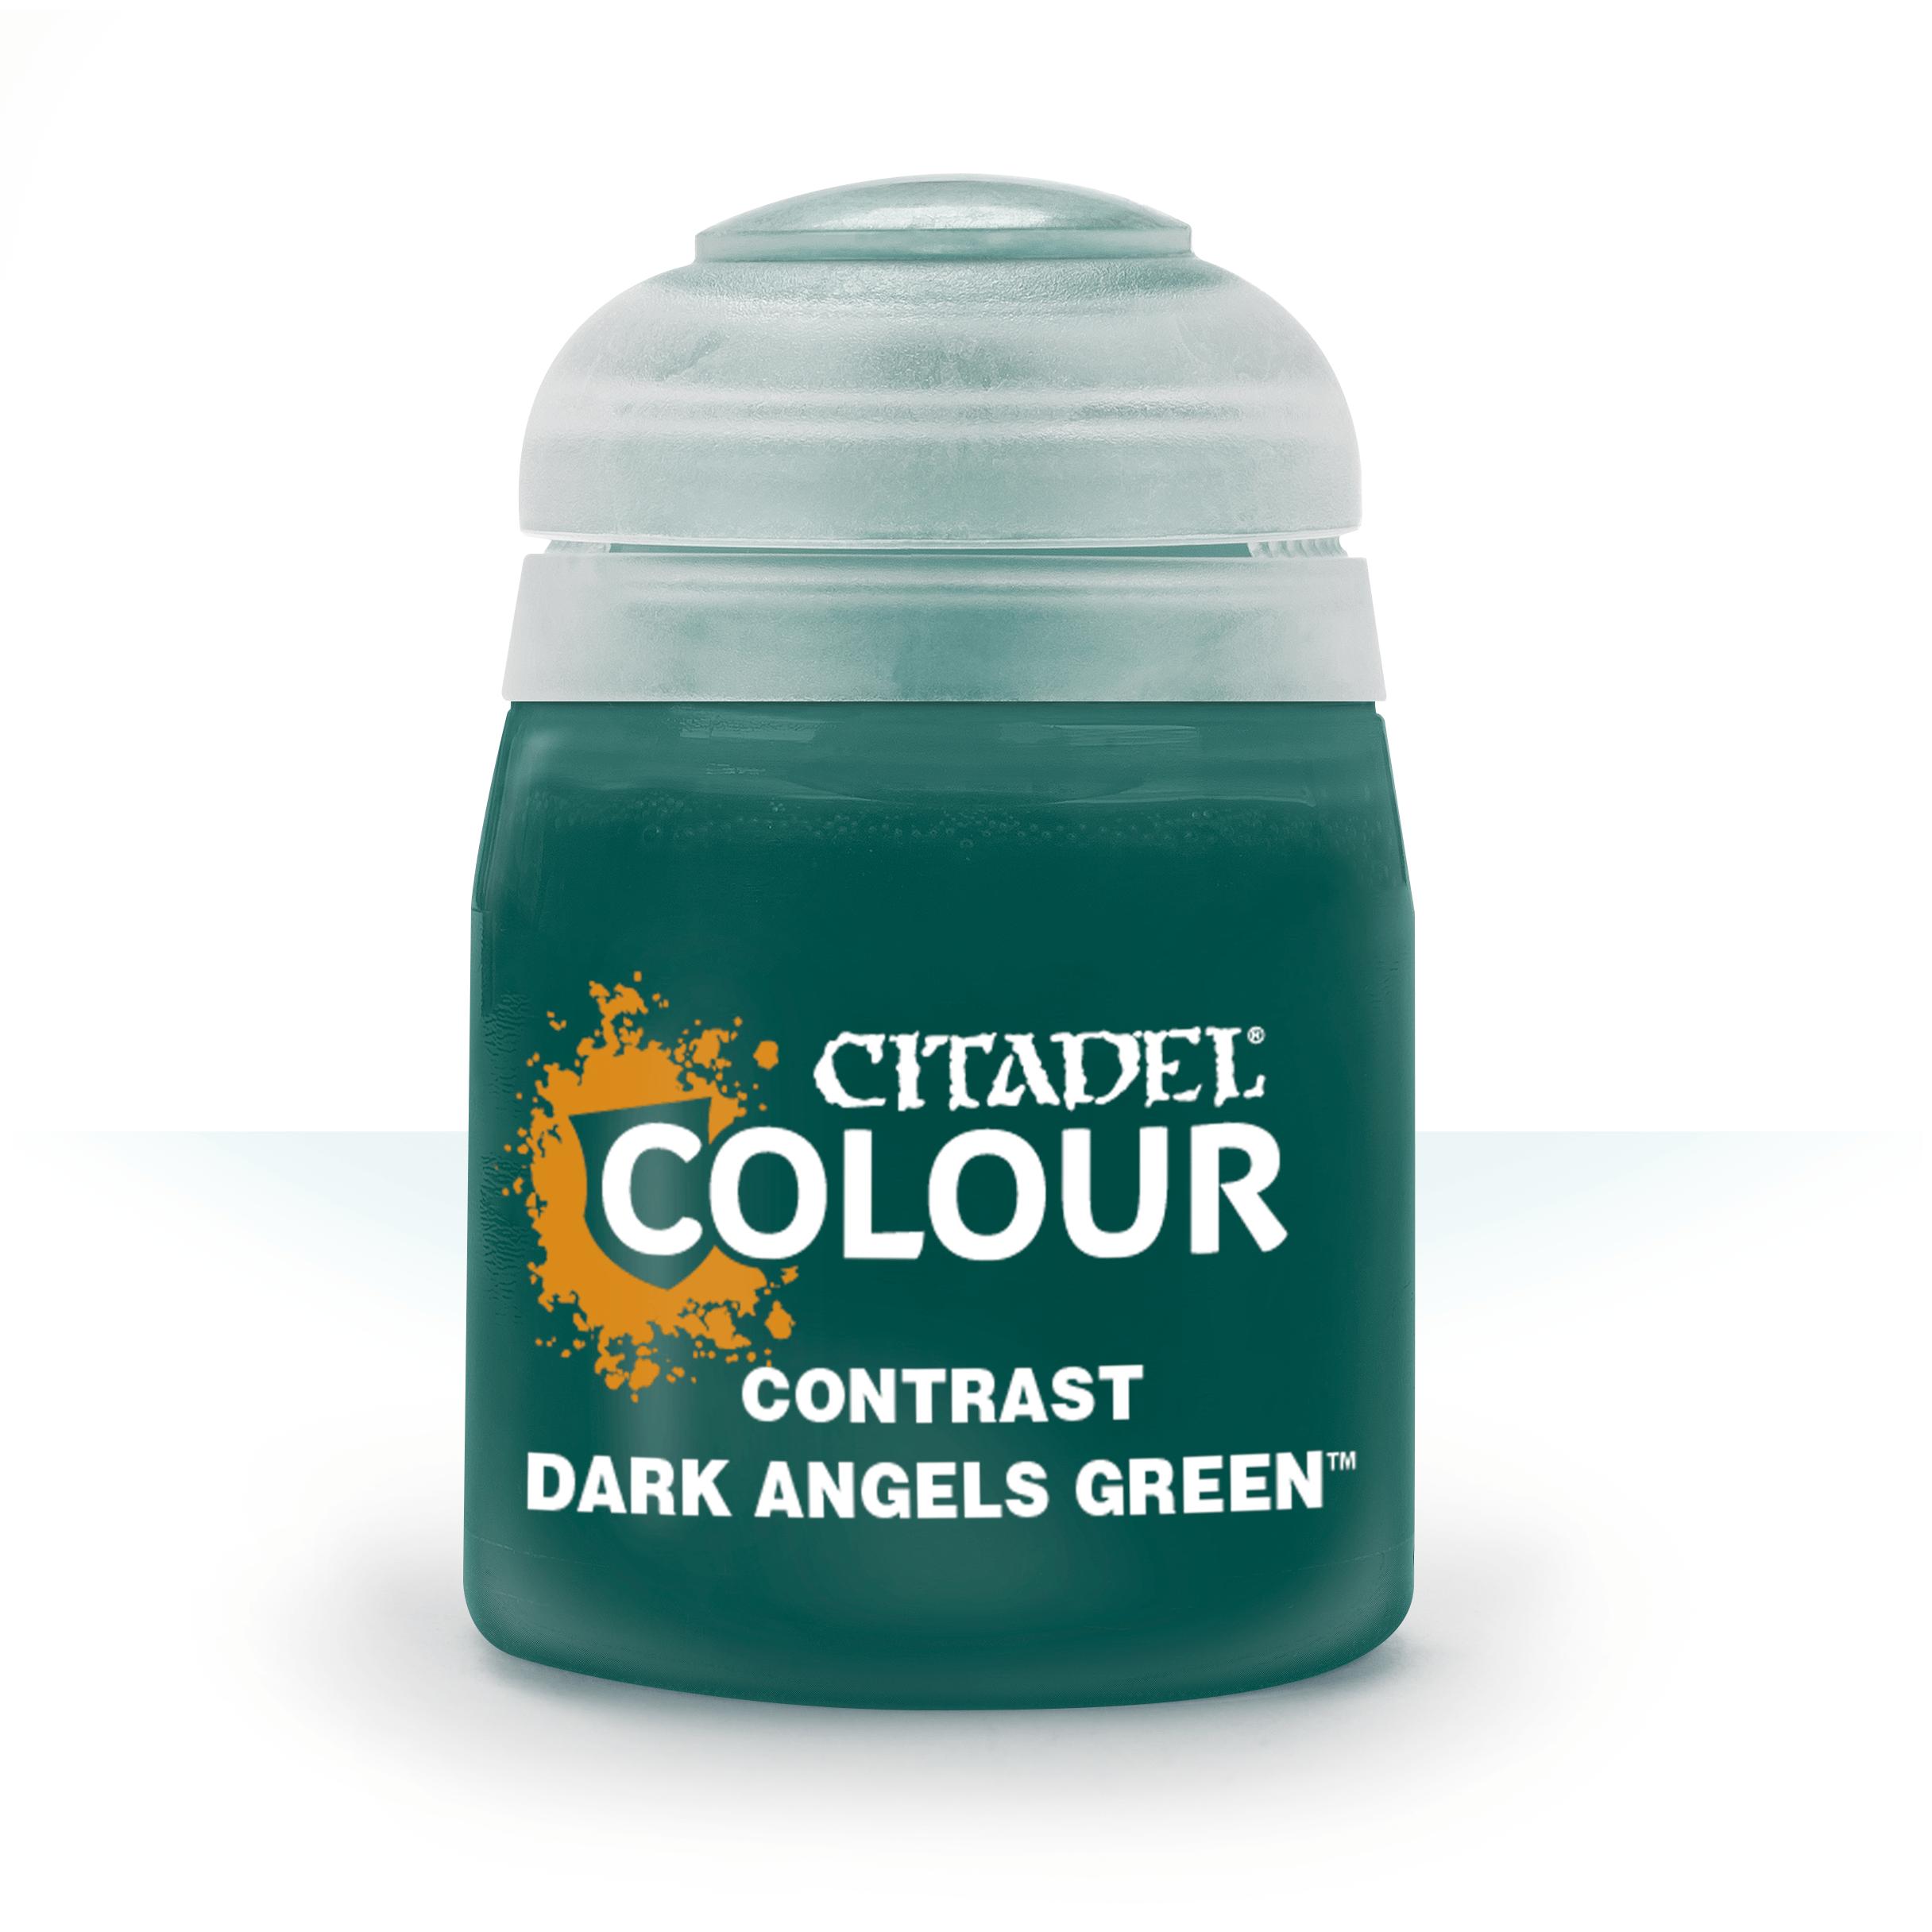 Dark Angels Green, Citadel Contrast 18ml